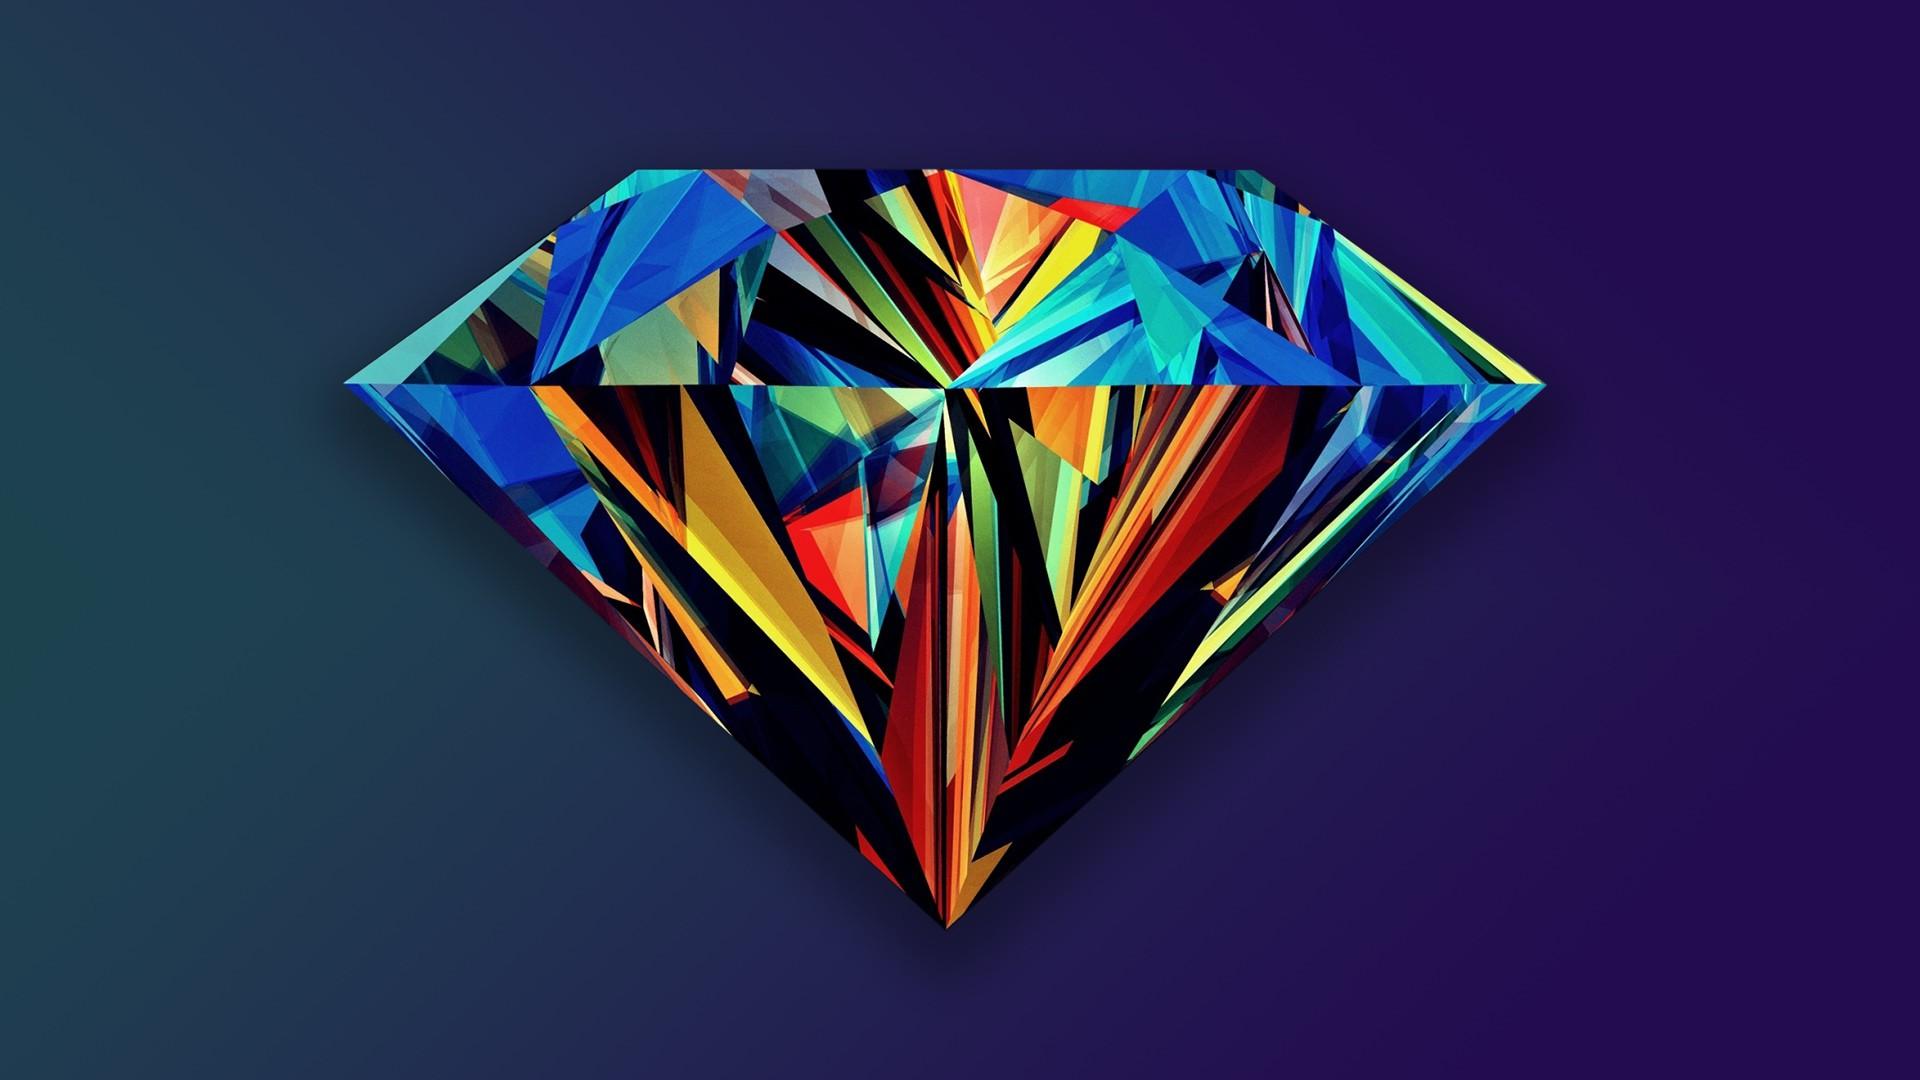 Naturally Occurring Colored Diamonds